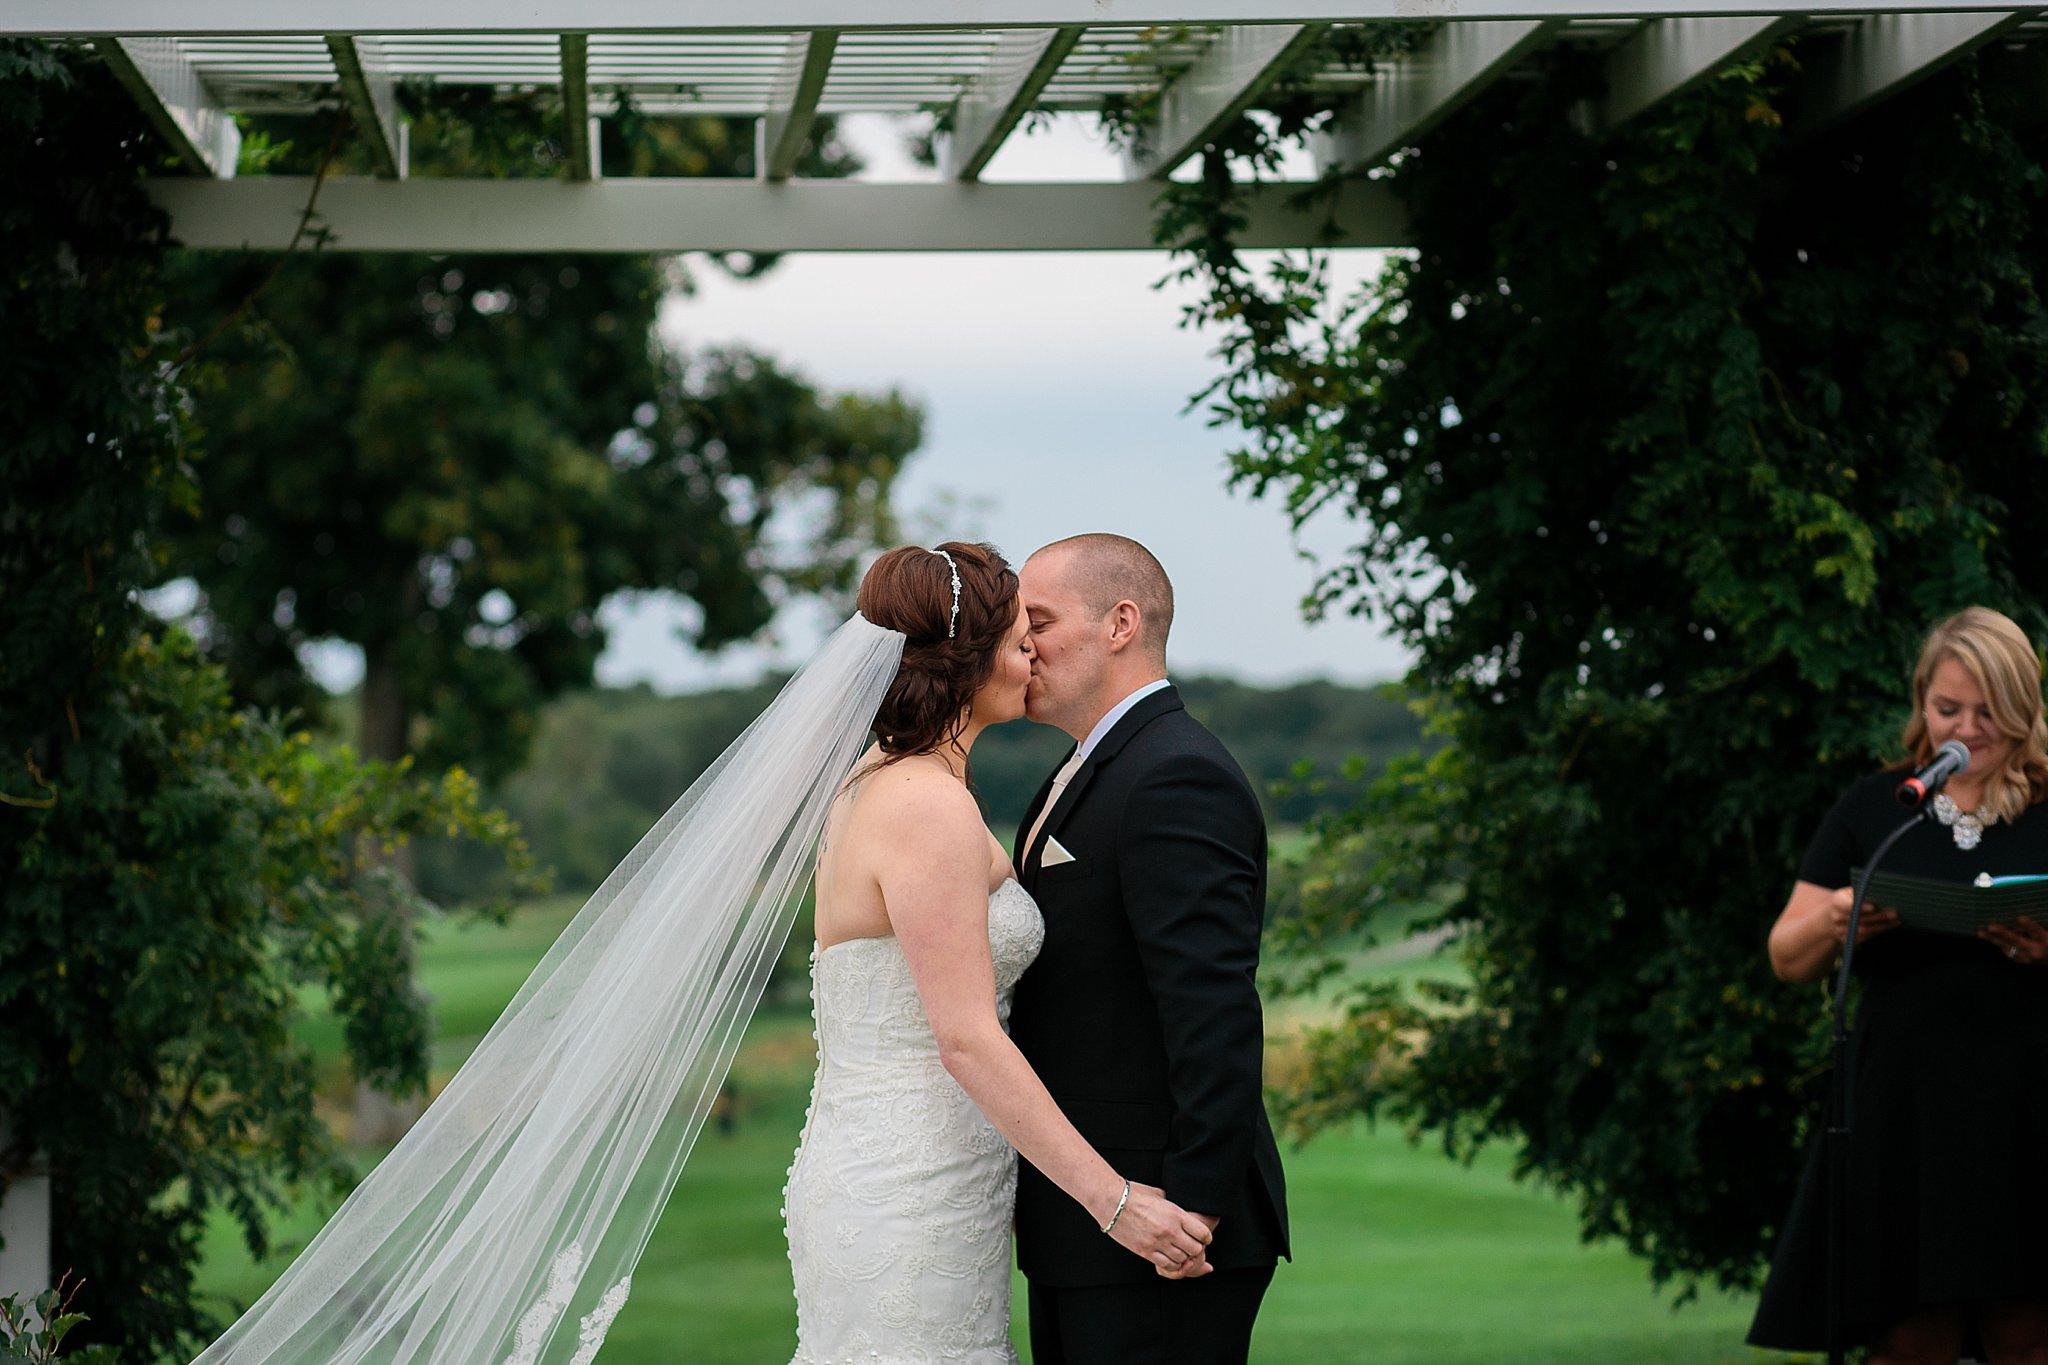 Links at Unionvale Wedding Lagrangeville Wedding Hudson Valley Wedding Photographer Sweet Alice Photography38.jpg